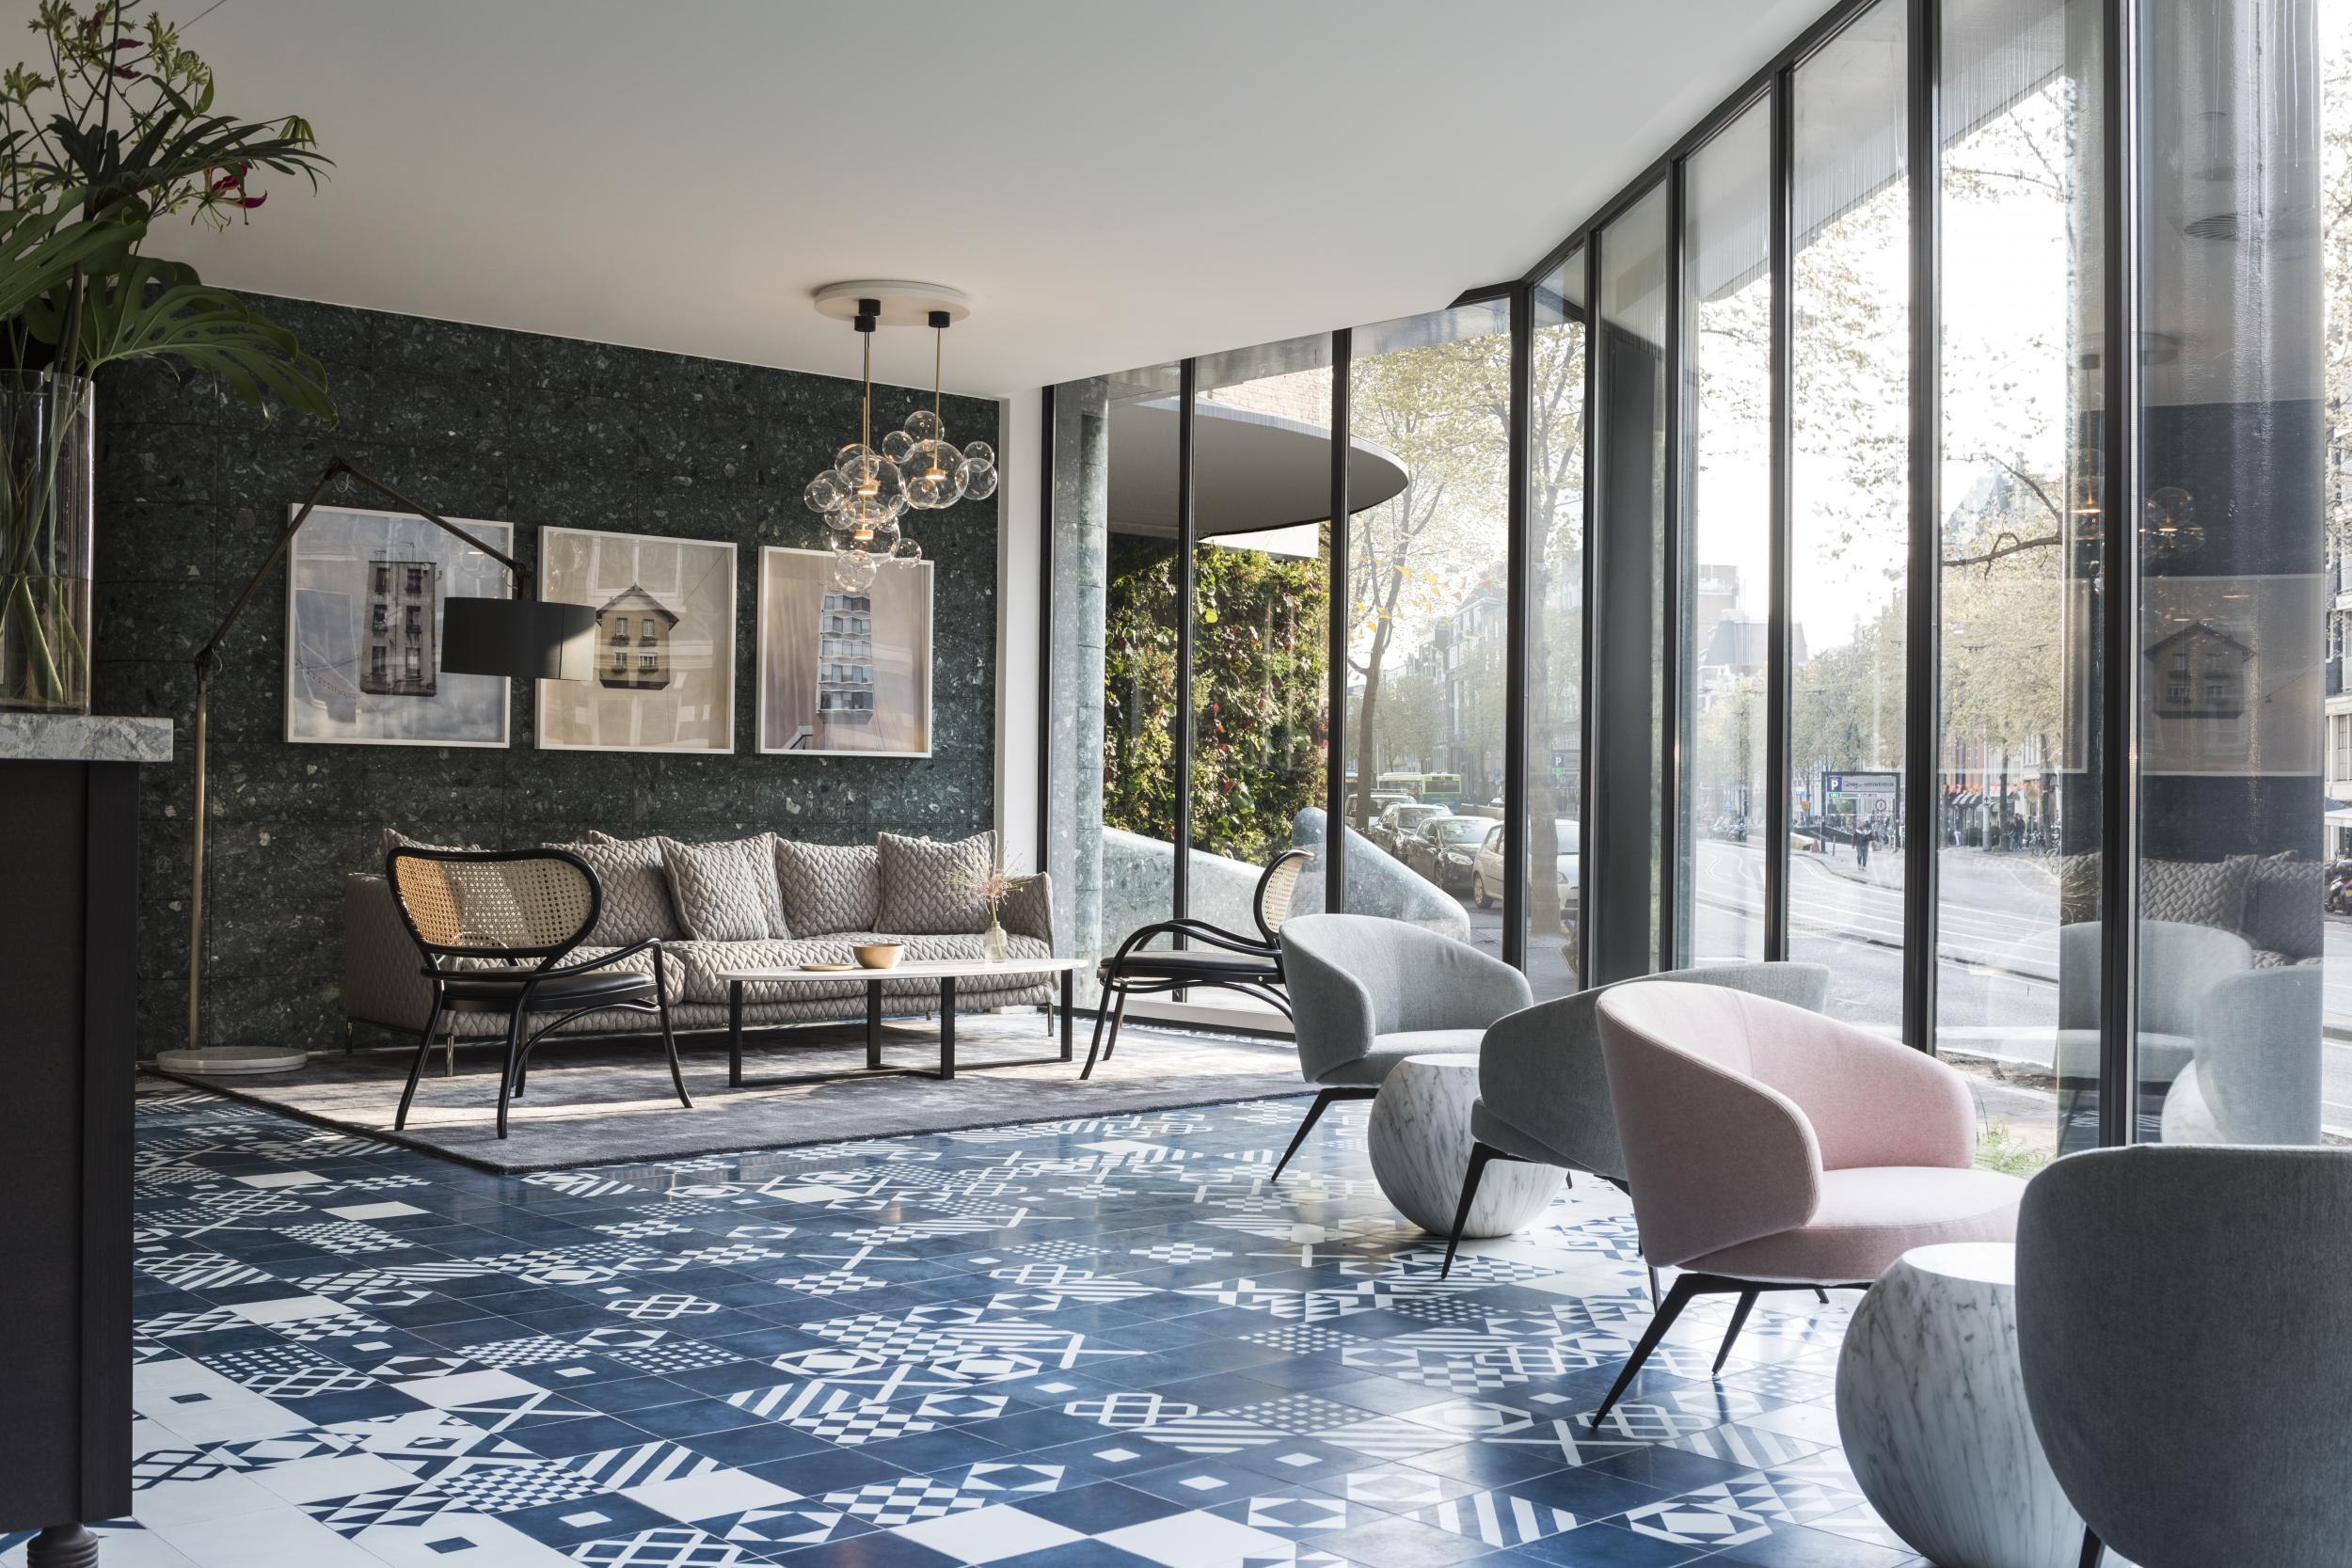 Kimpton De Witt hotel review: Is this Amsterdam's most convenient boutique hotel?